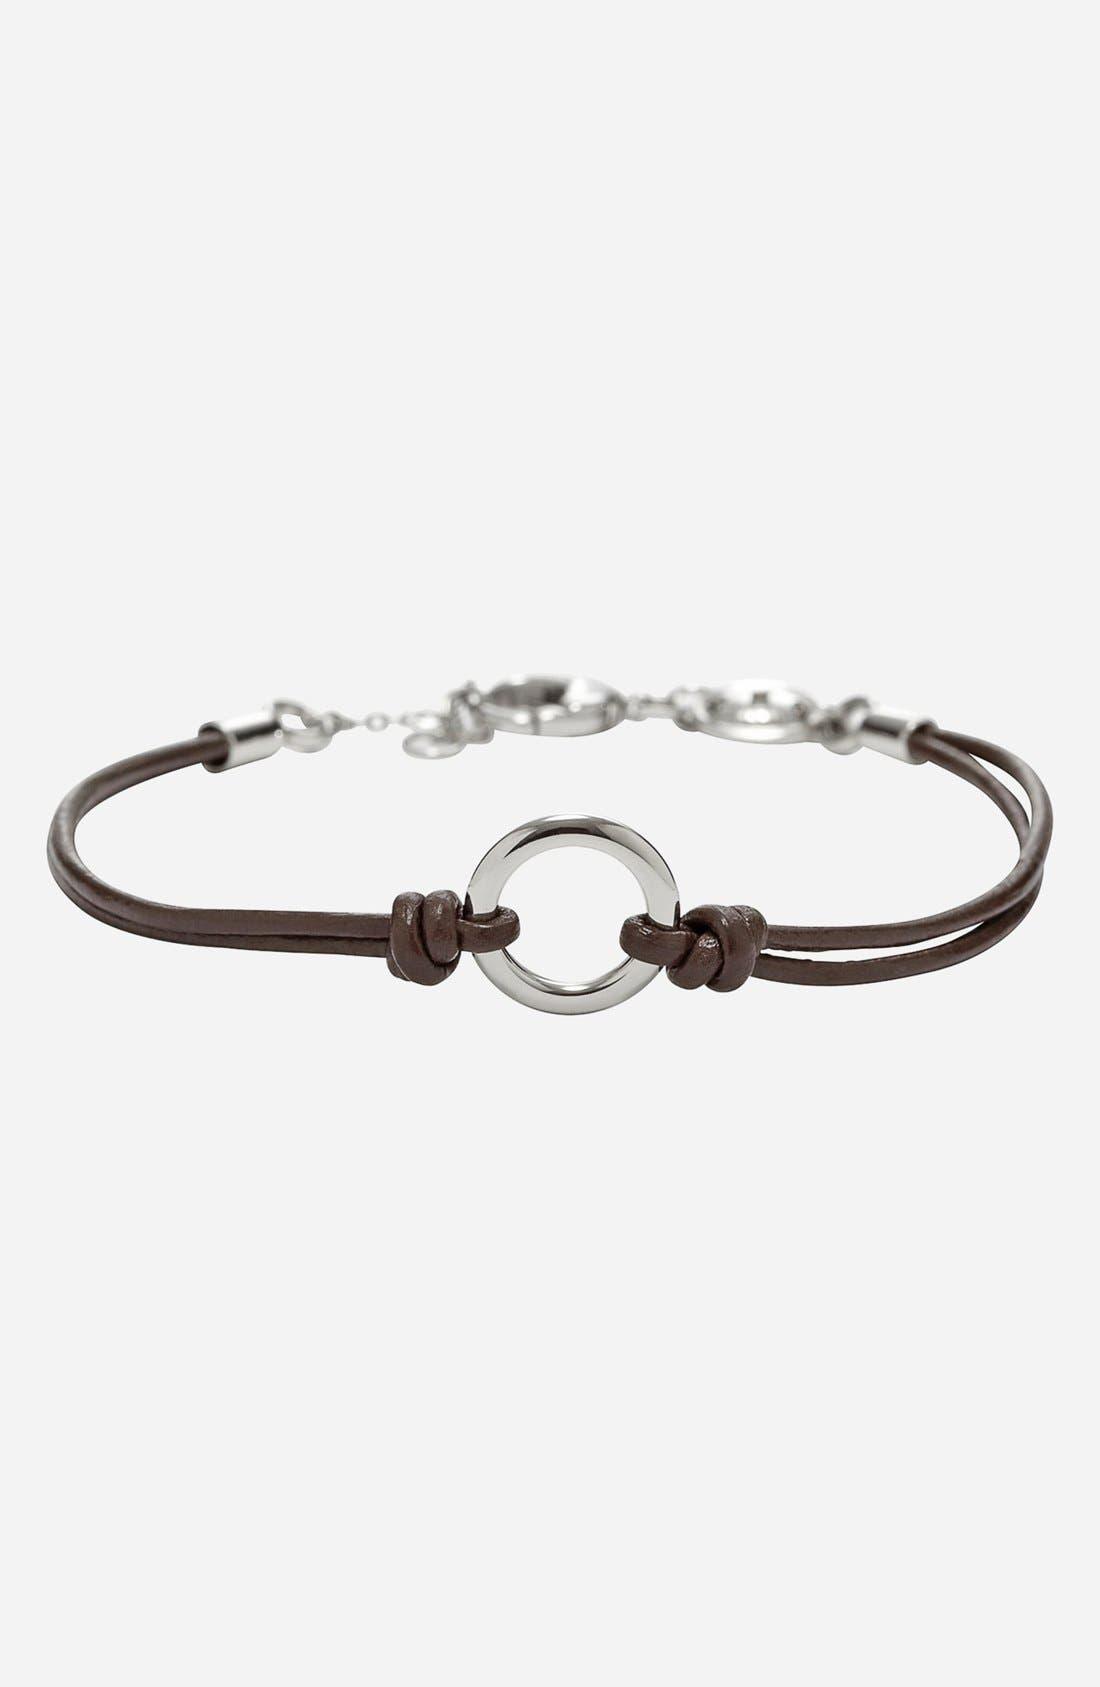 Main Image - Fossil Leather Charm Bracelet